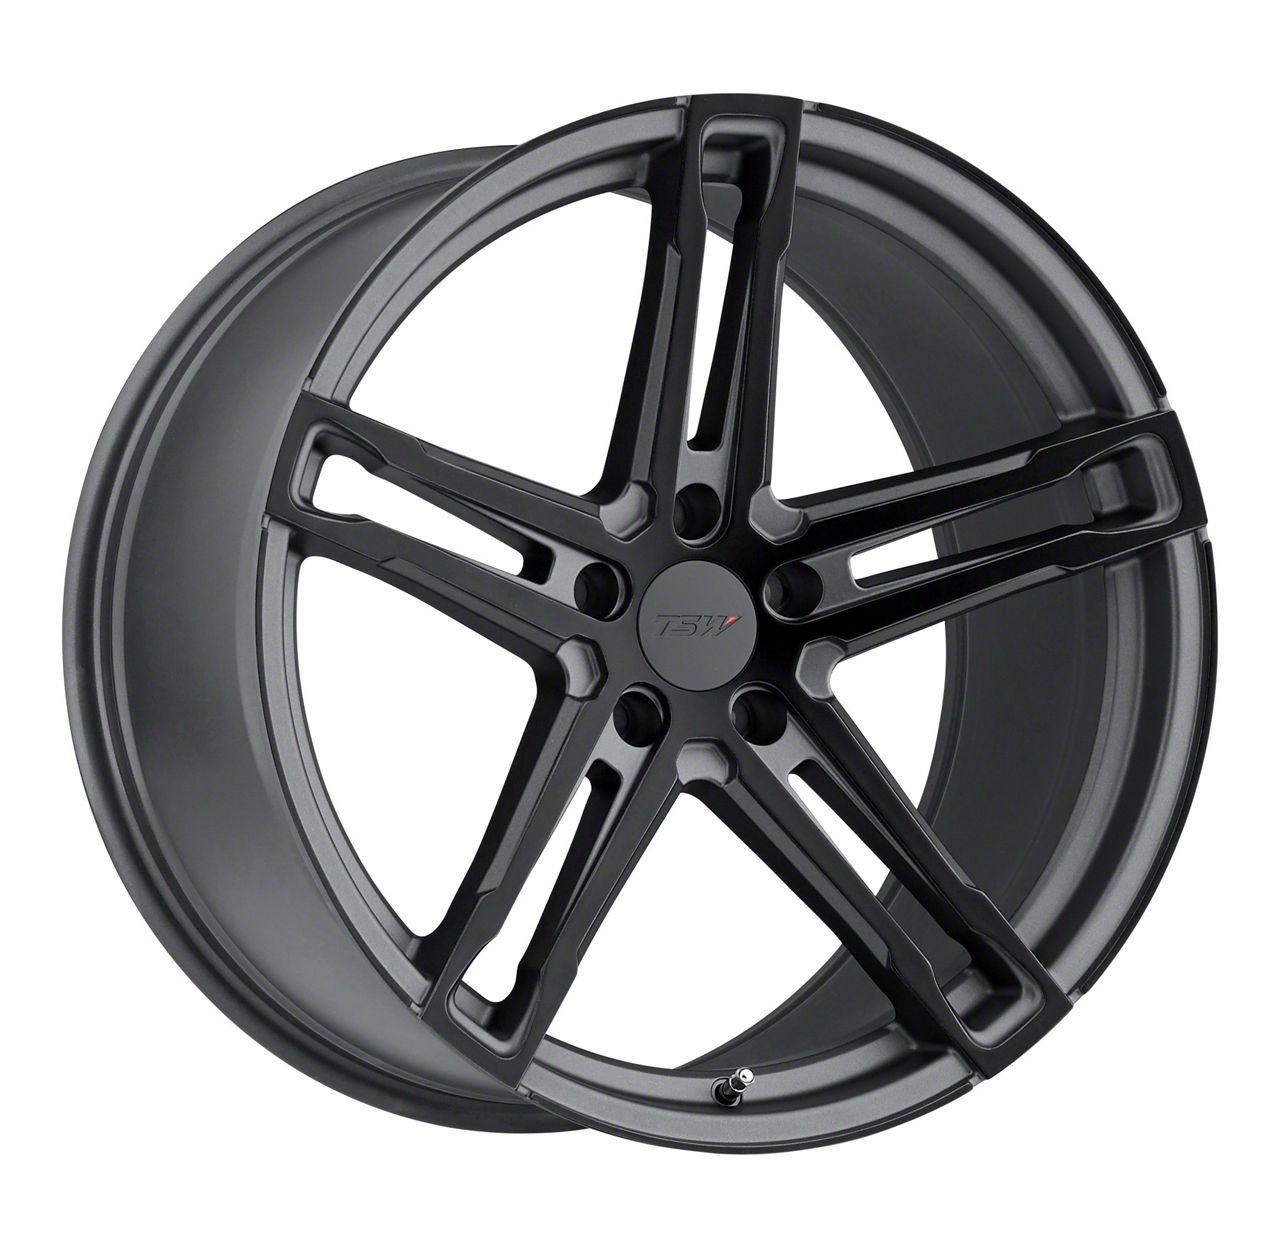 TSW Mechanica Matte Gunmetal w/ Matte Black Face Wheel - 20x11 - Rear Only (05-14 All)